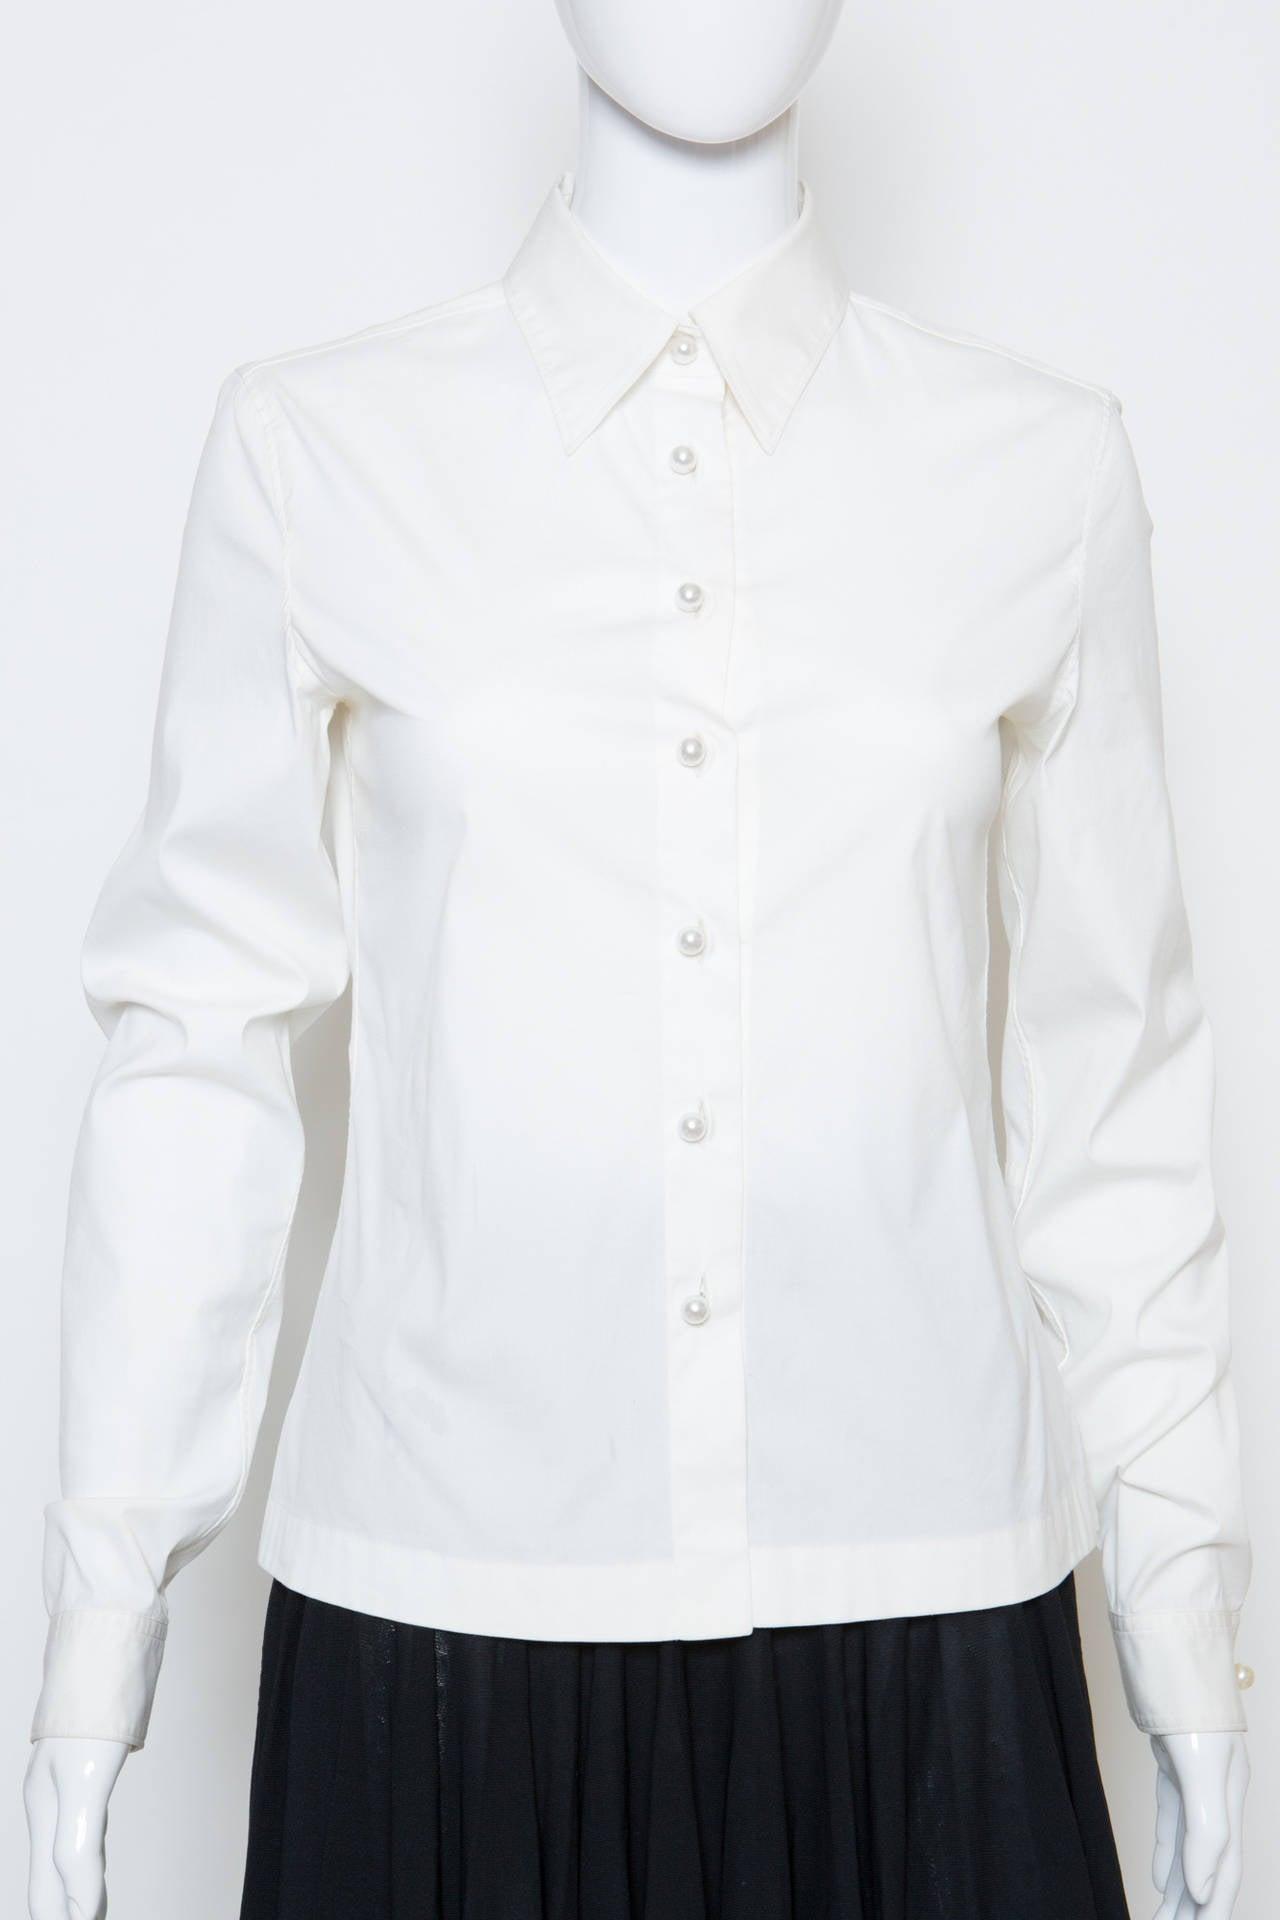 Chanel White Shirt With Black Vinyl Leather Corset Belt 5